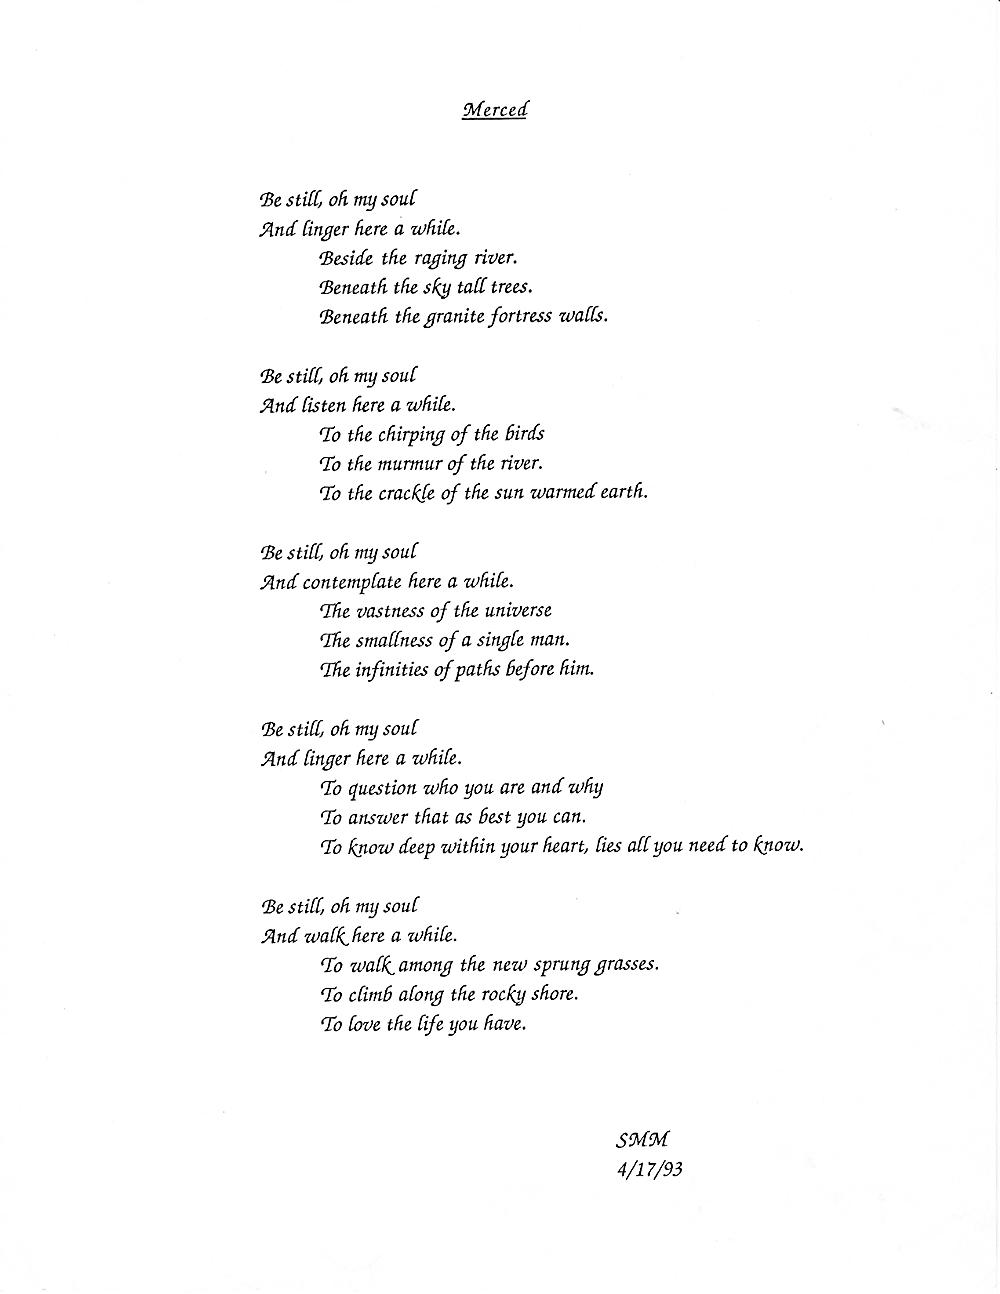 Mark's poem